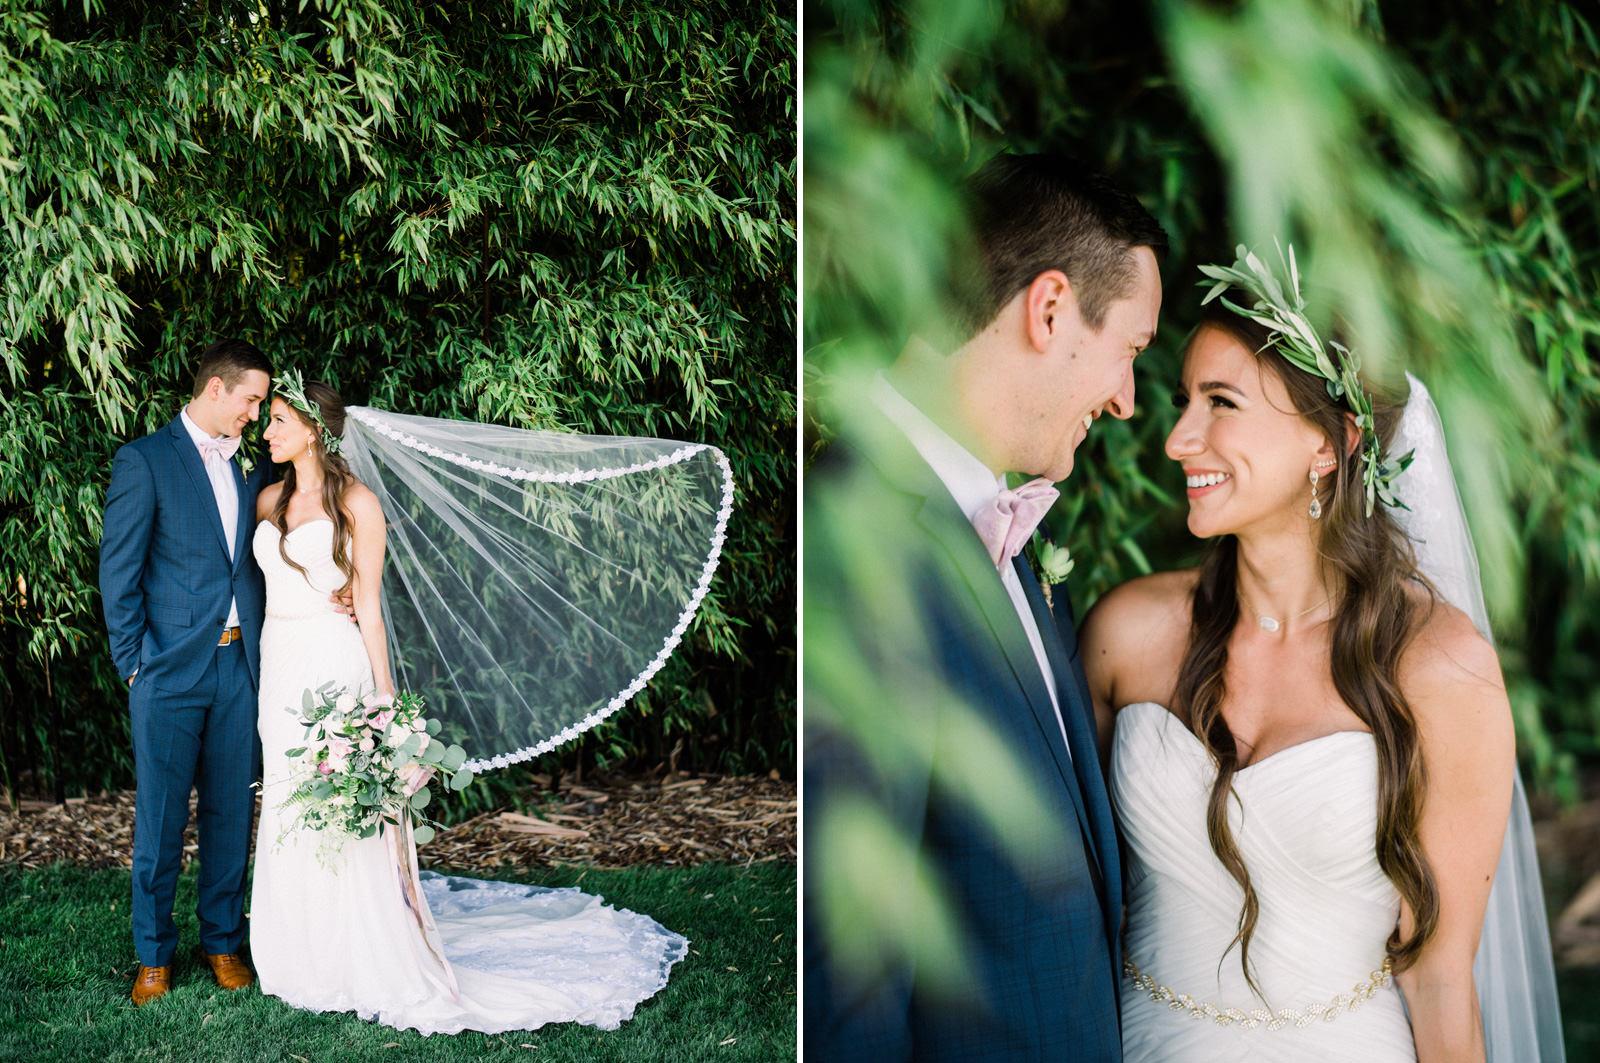 033-woodinville-lavendar-farm-wedding-with-golden-glowy-photos.jpg